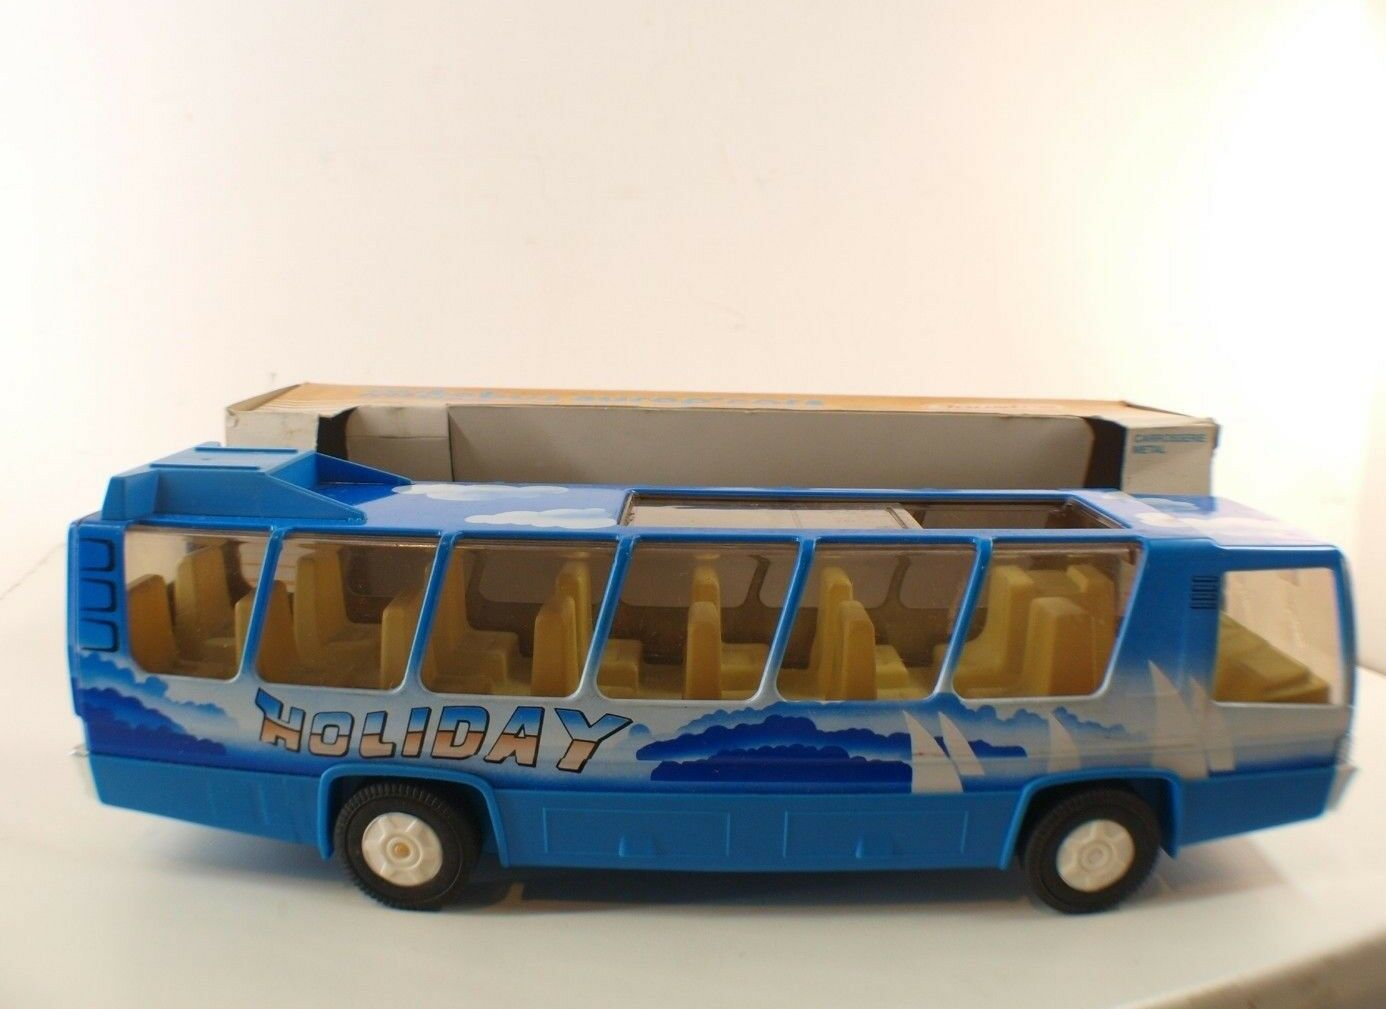 Joustra n° 0473 Autobus Europ'cars Holliday à friction neuf en boîte inbox NMIB